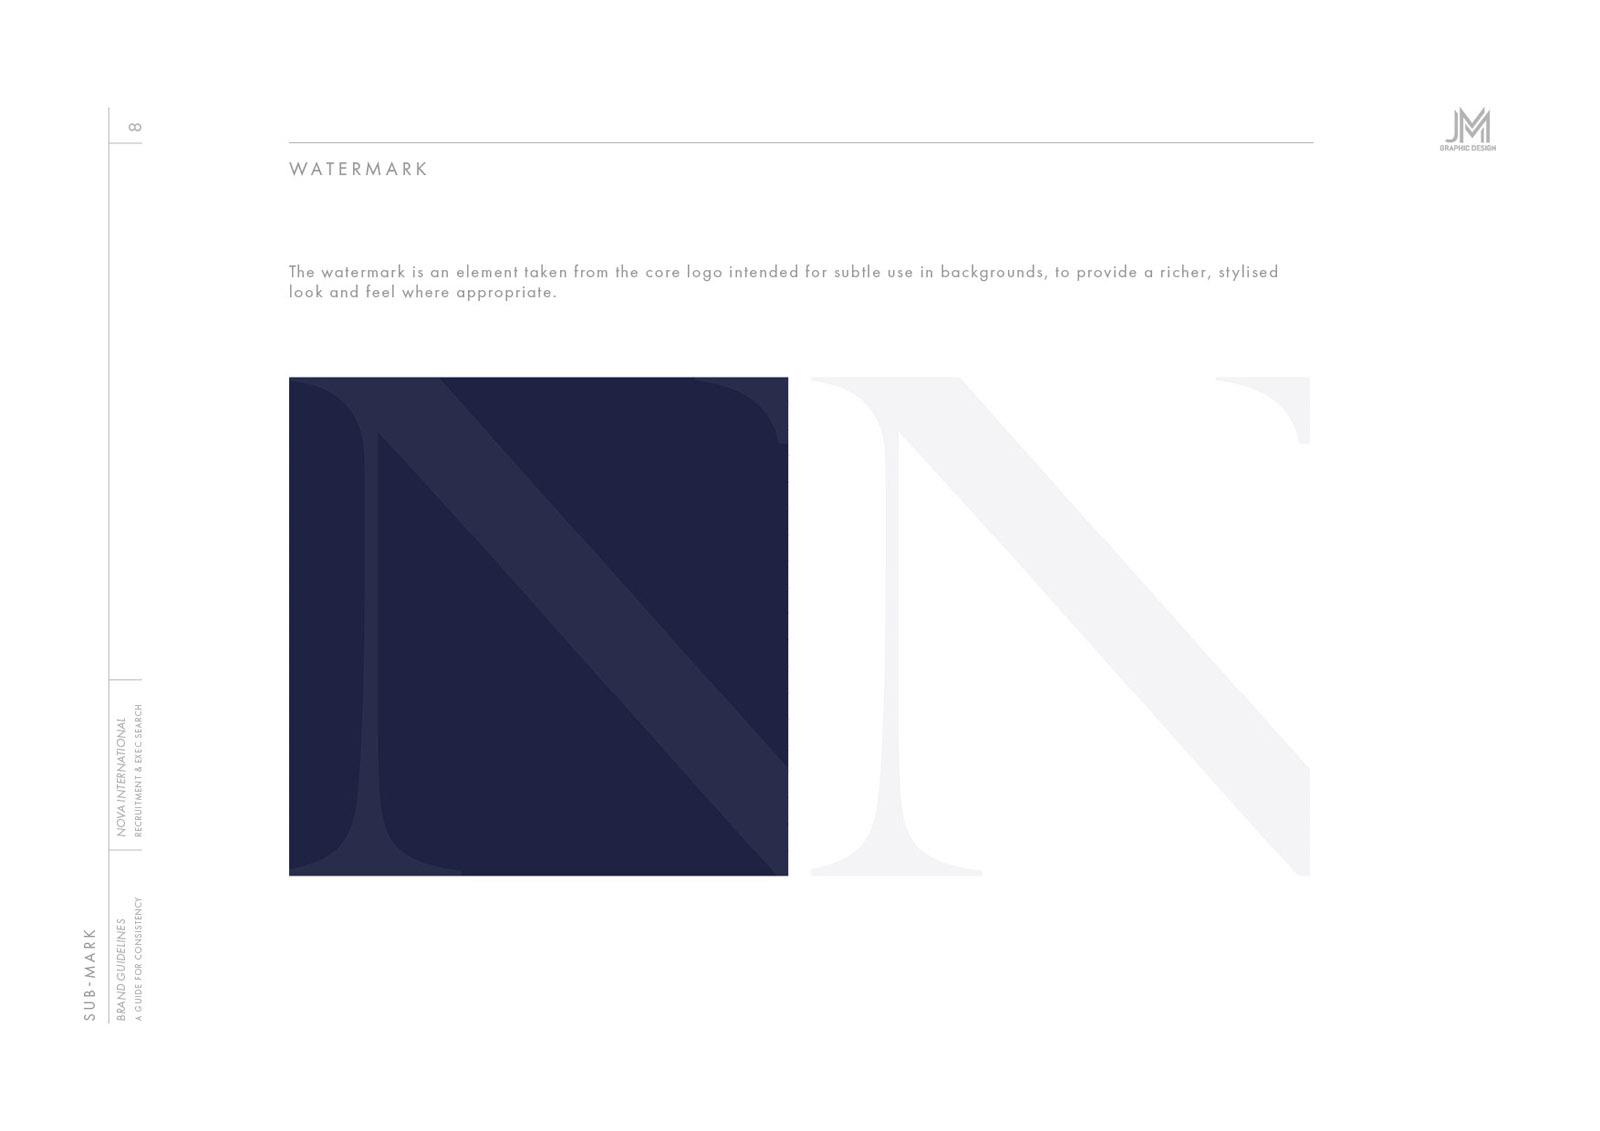 brand-identity-graphic-designer-london-recruitment-logo08